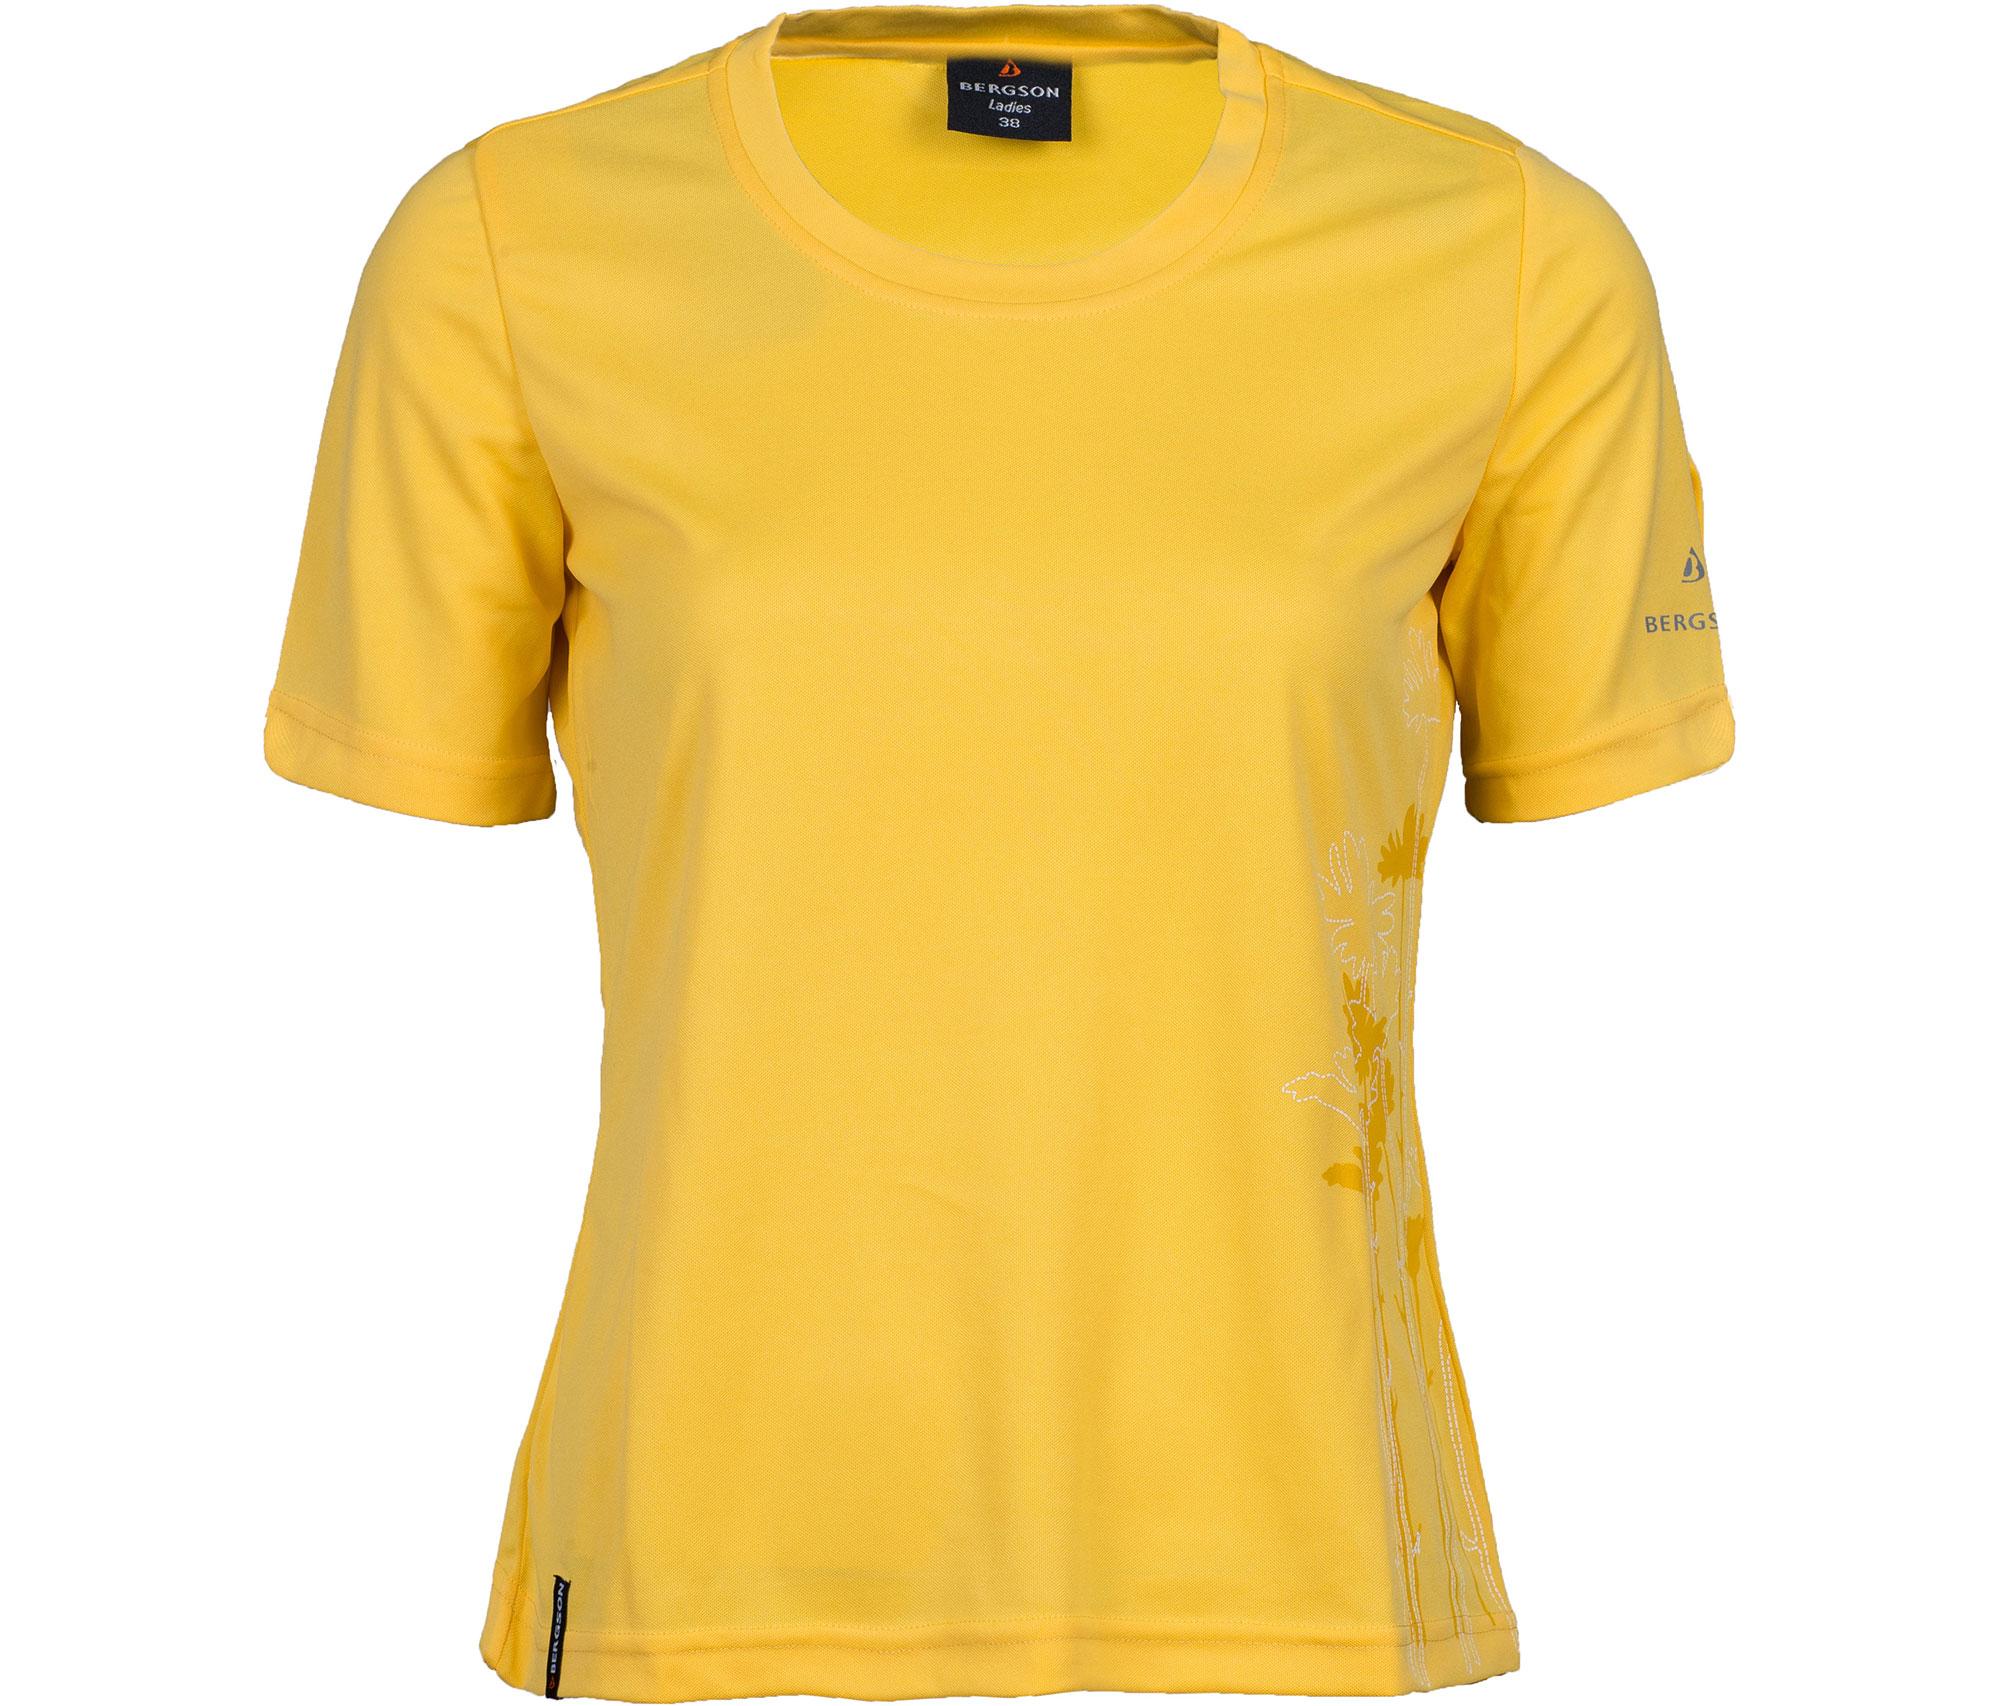 Pique-Material femininer Schnitt Rundhalsausschnitt pflegeleicht schnelltrocknend Bergson Damen Funktionsshirt EDA Frontdruck